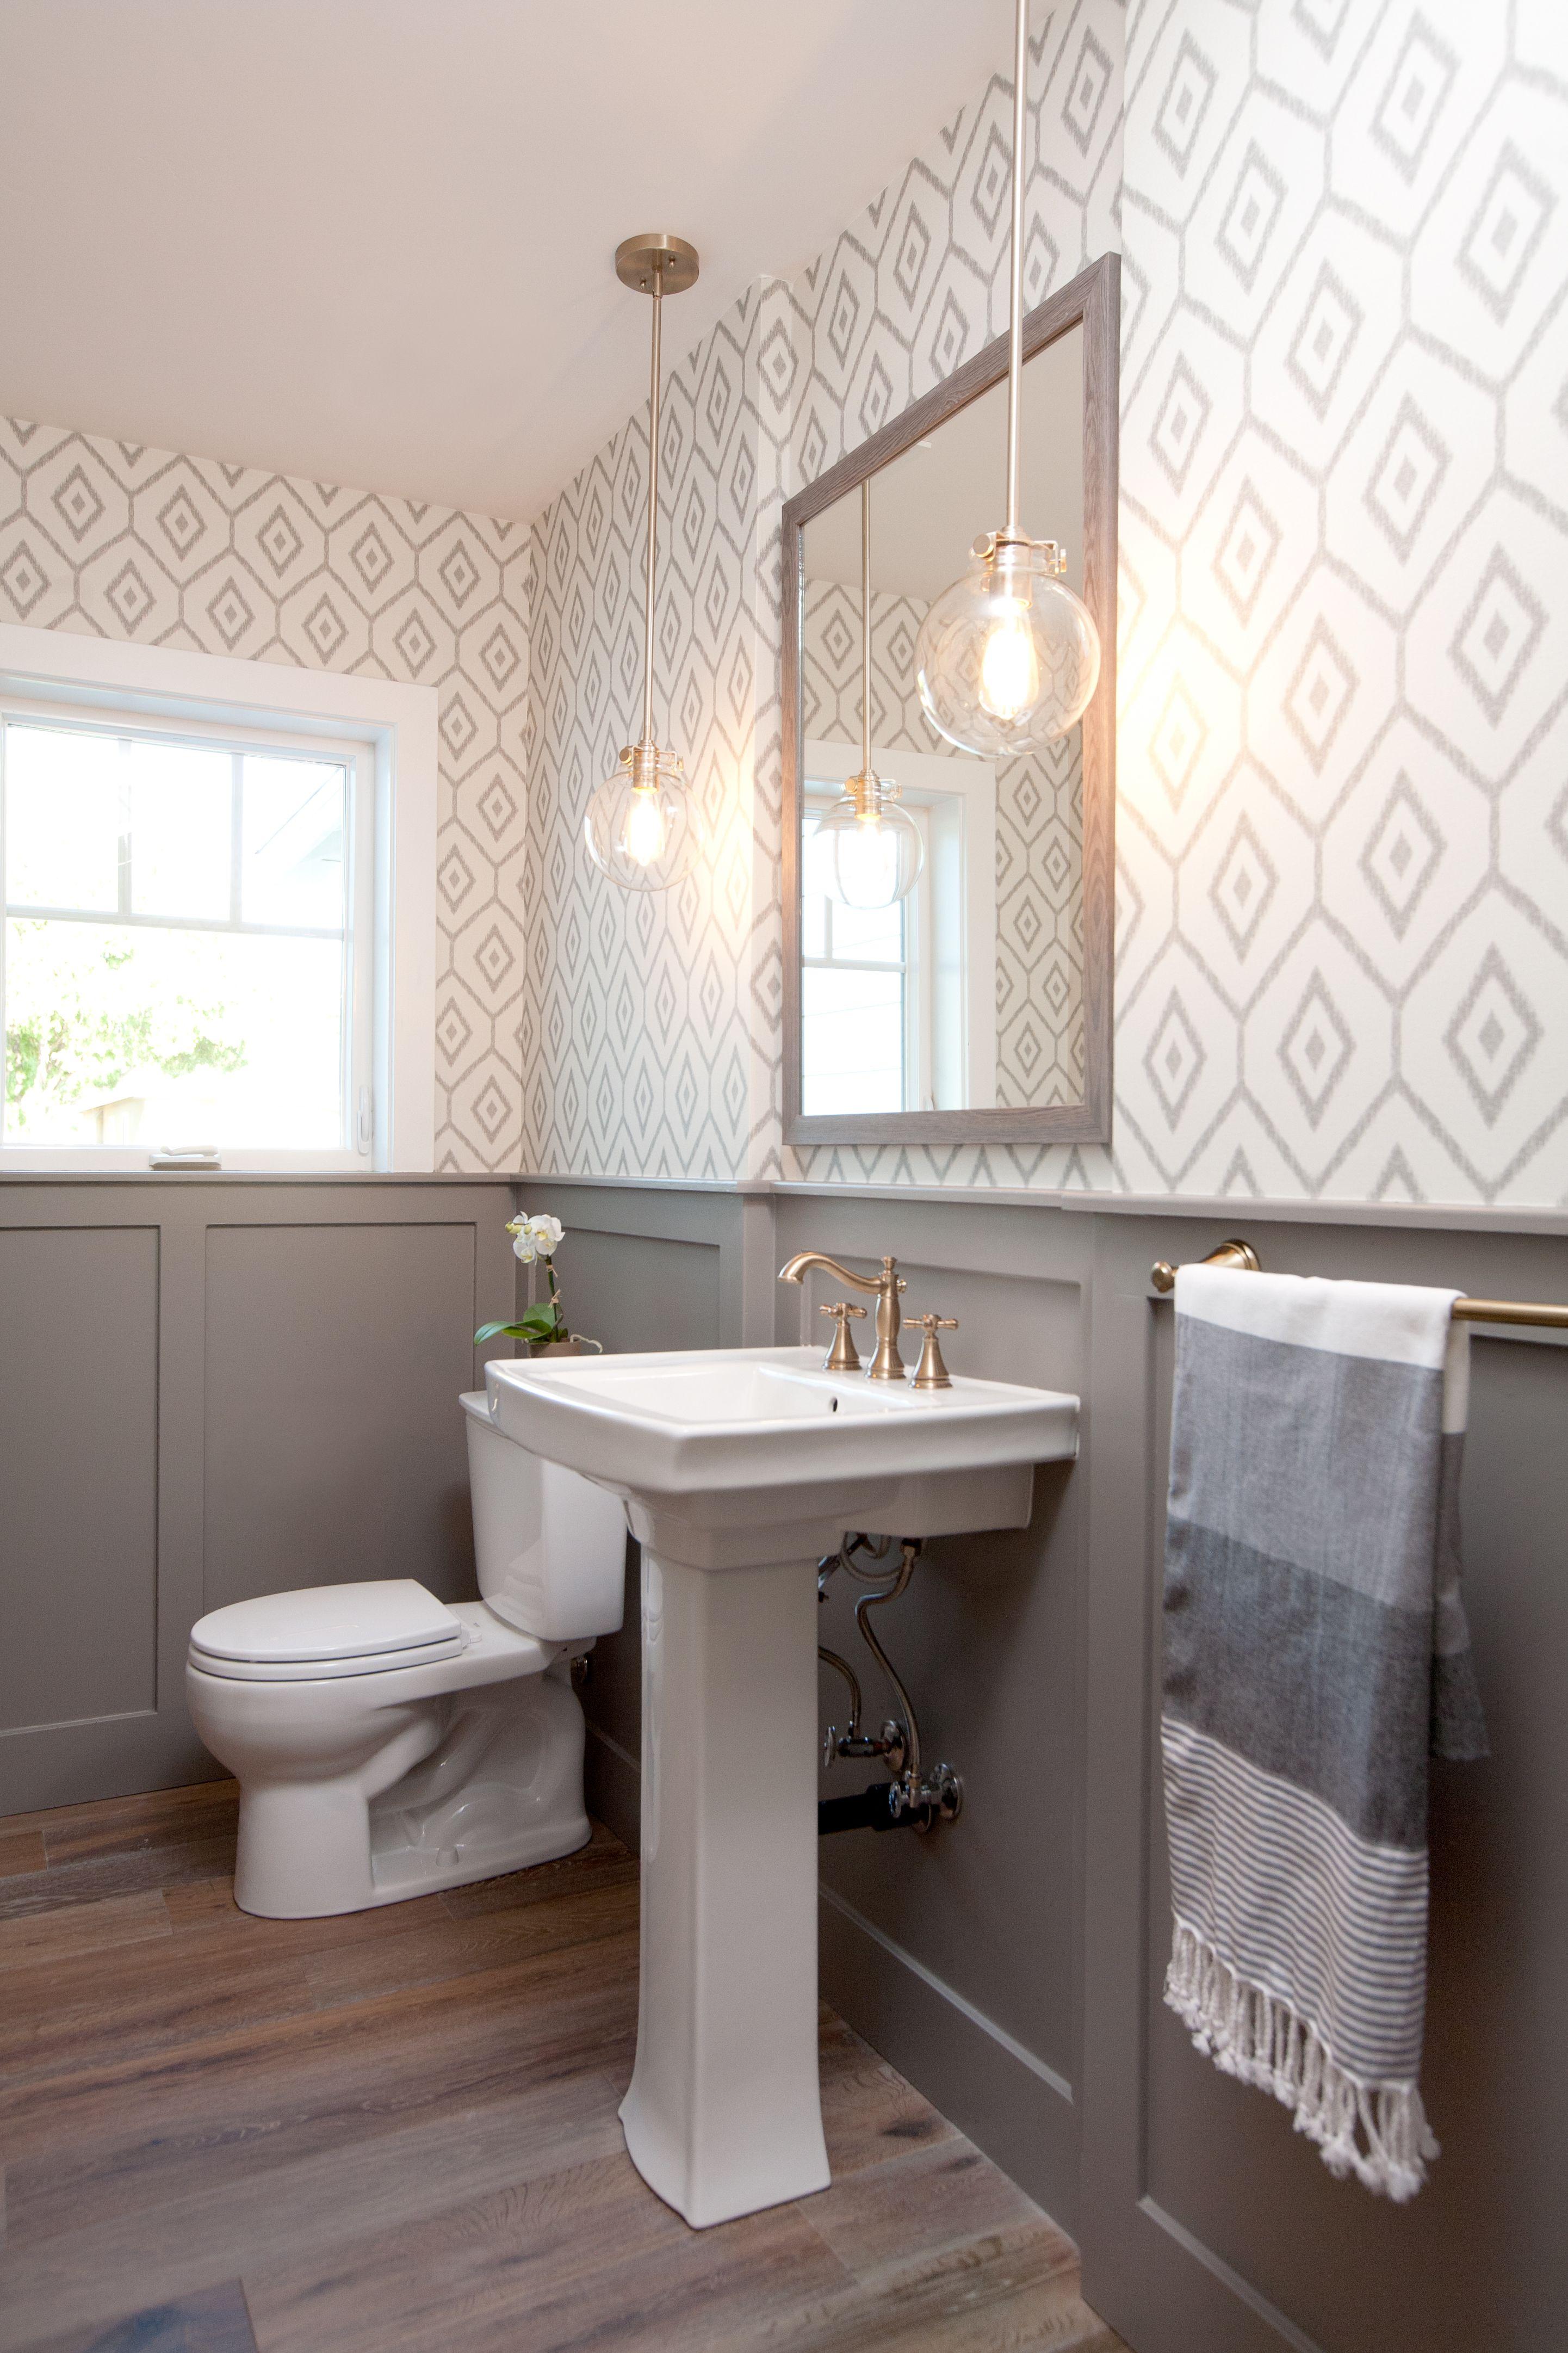 ArcadiaHouseEdit  Home  Pinterest  Bathroom House